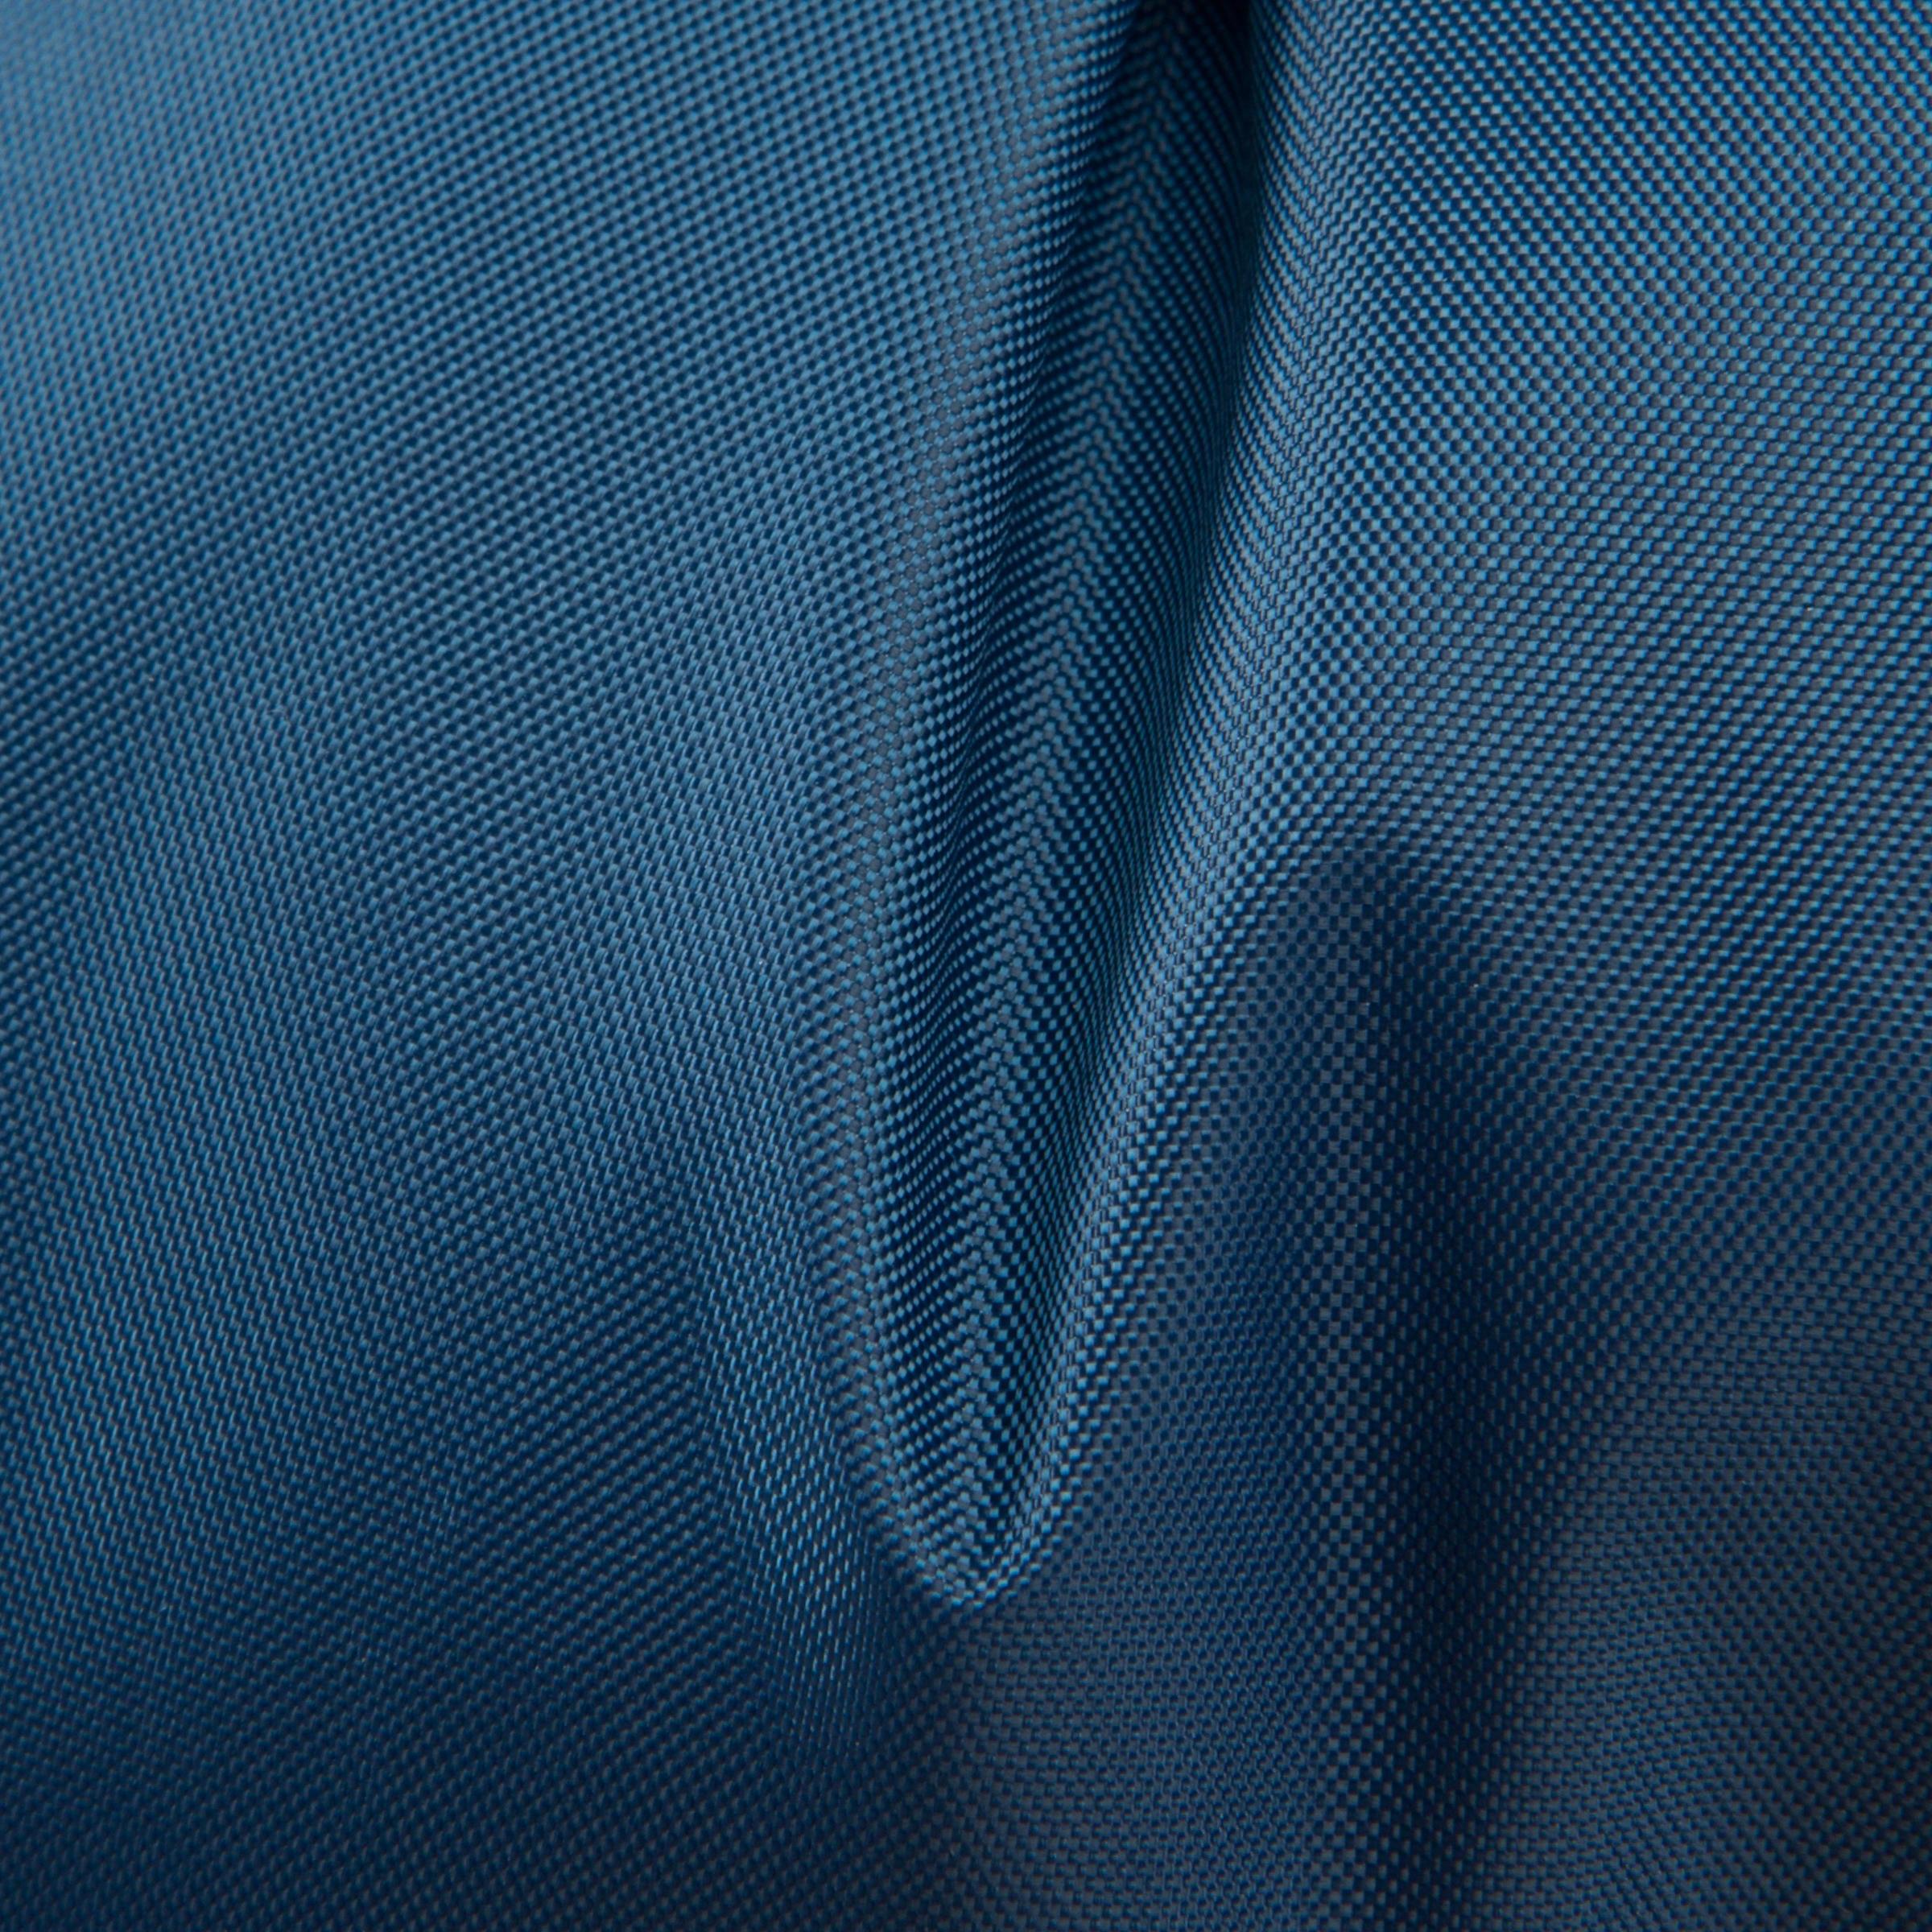 Light Team Sports Bag 15 Litres - Blue